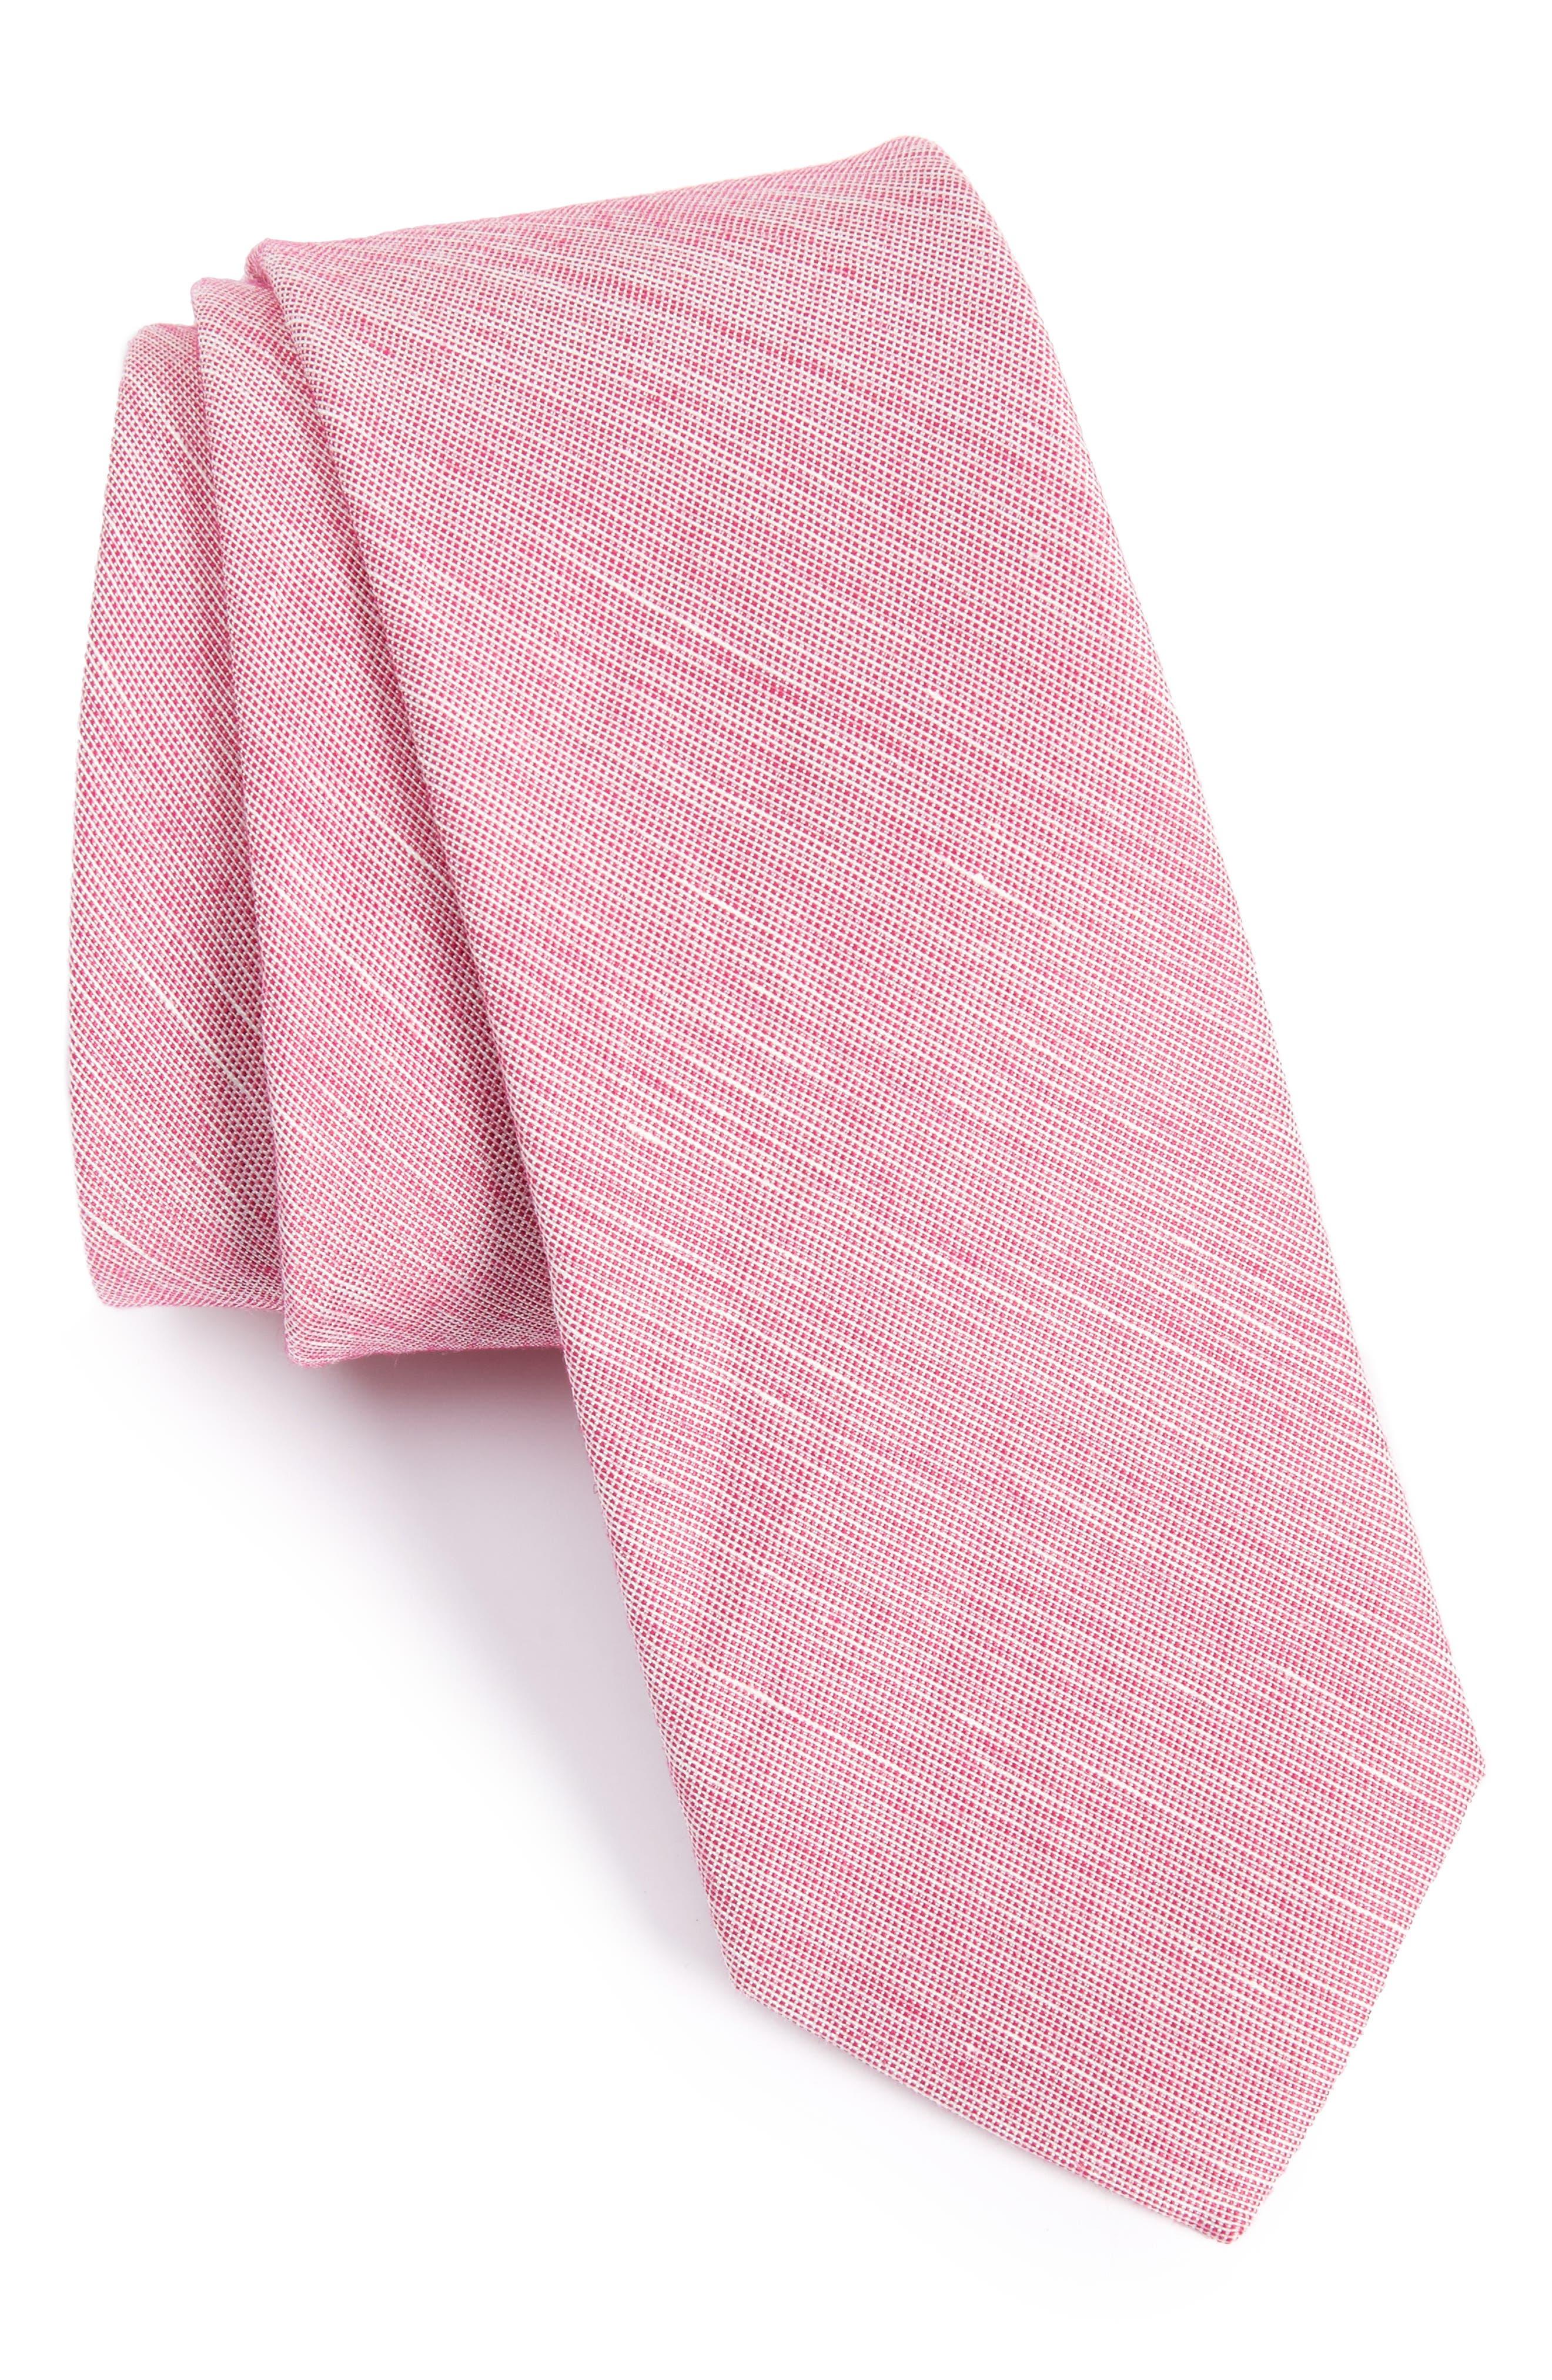 Adena Solid Silk Blend Skinny Tie,                             Main thumbnail 6, color,